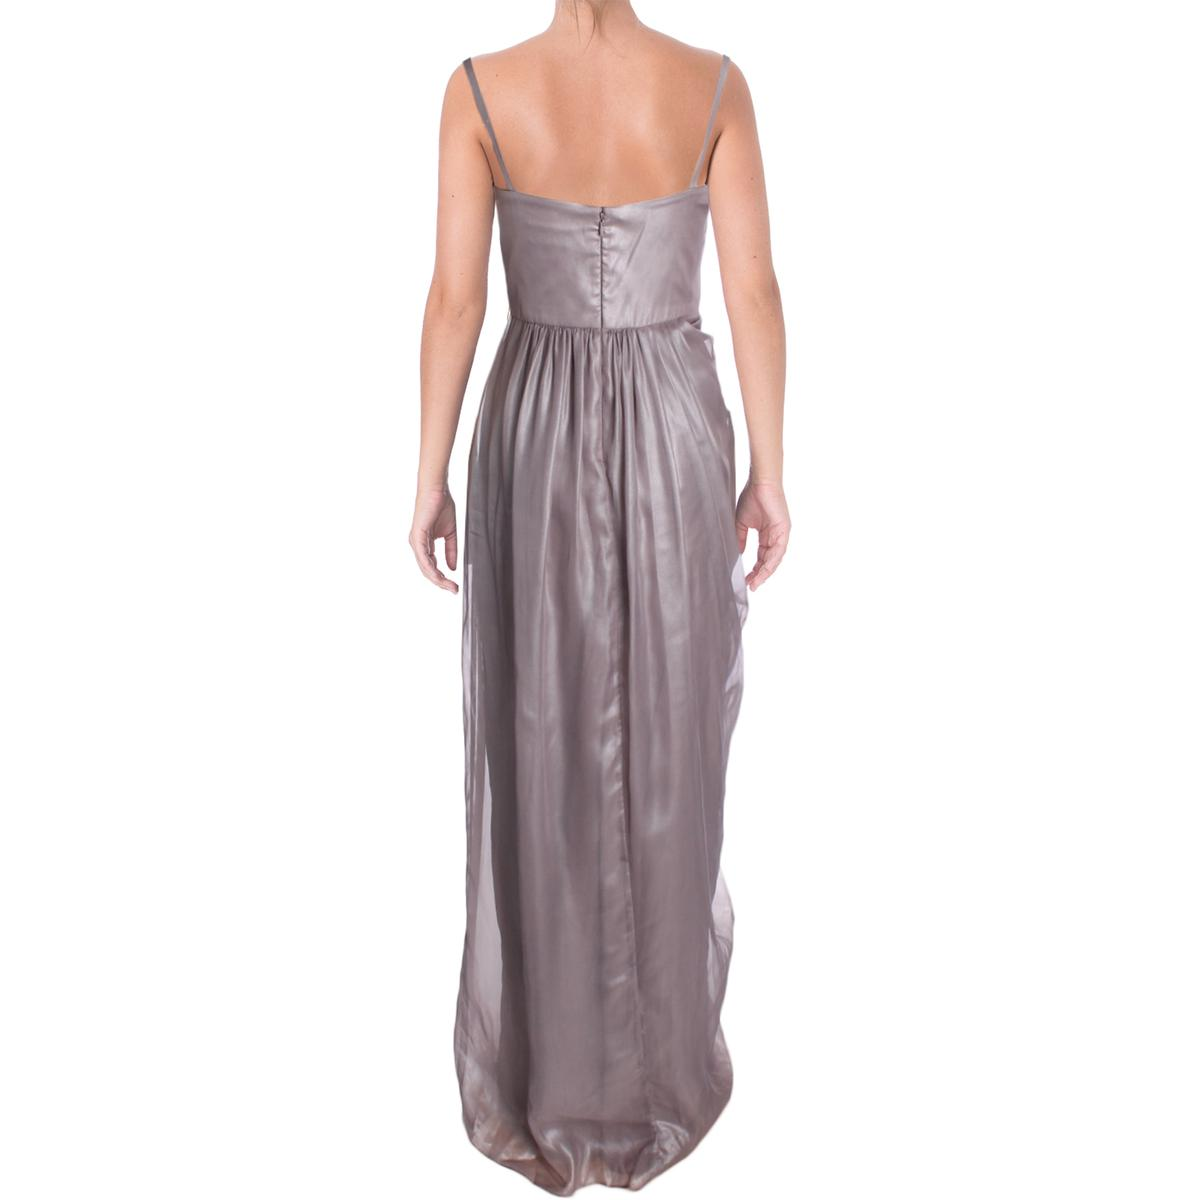 Vera-Wang-Womens-Chiffon-Shimmer-Sleeveless-Evening-Dress-Gown-BHFO-5823